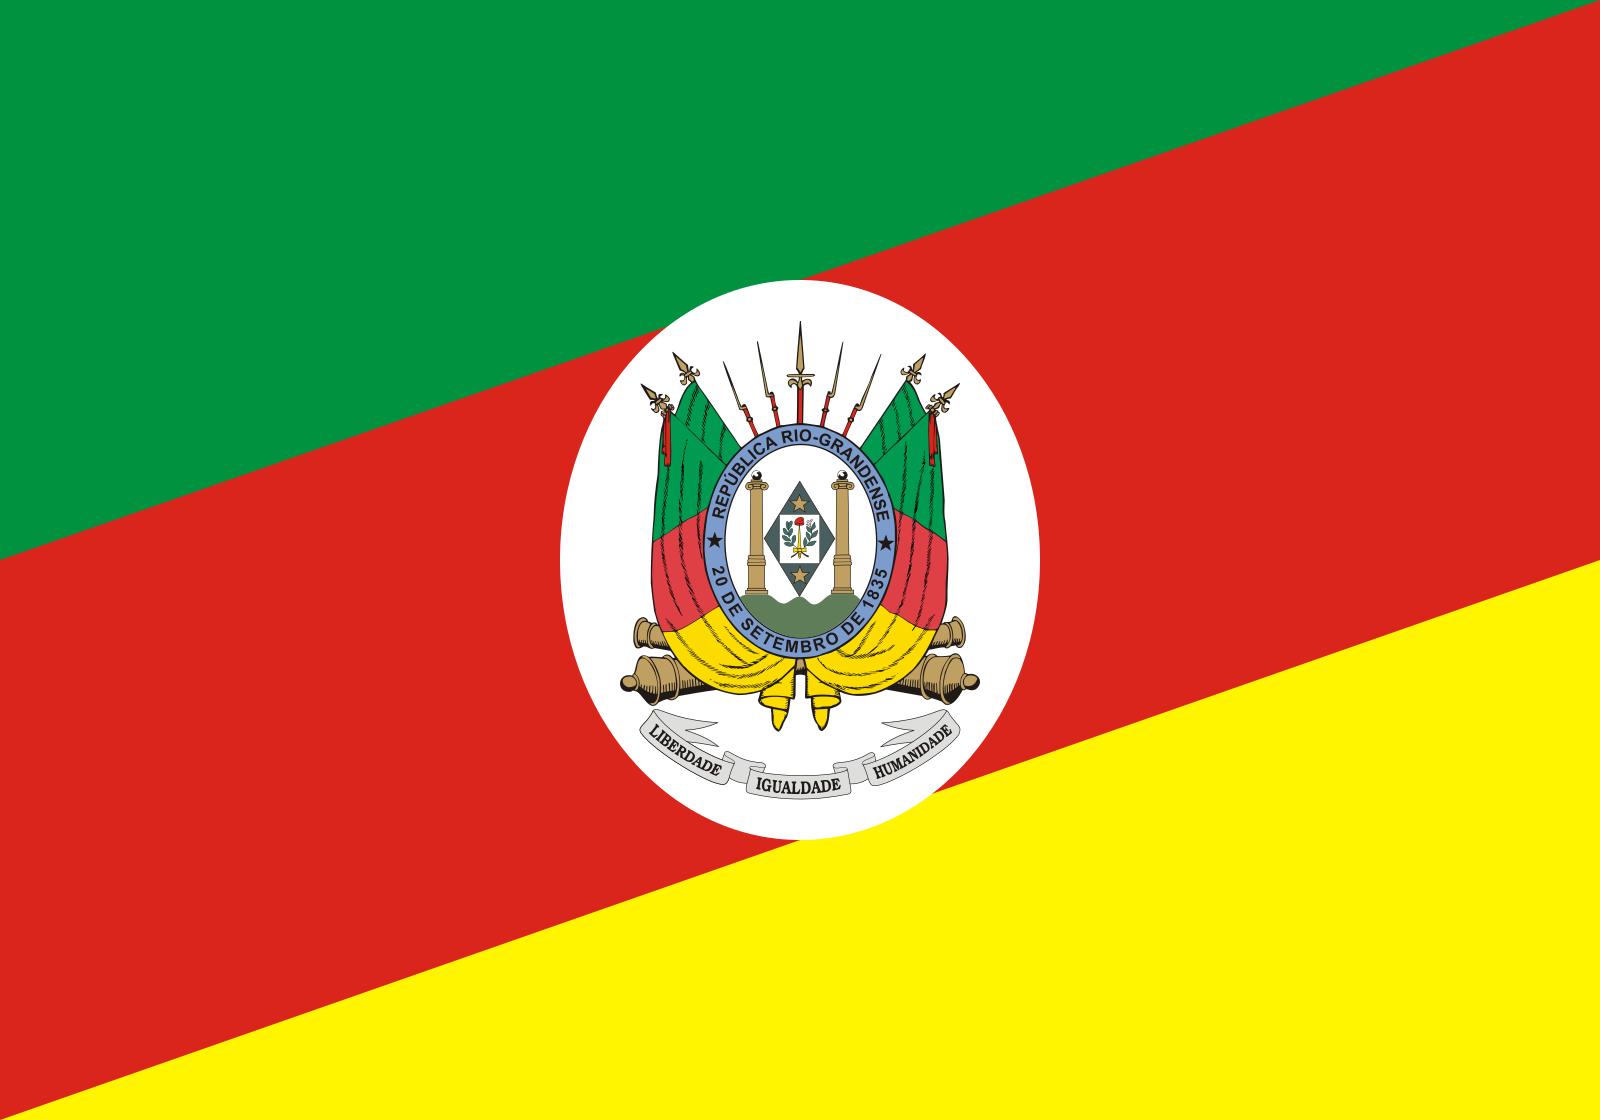 bandeira-do-estado-do-rio-grande-do-sul-2